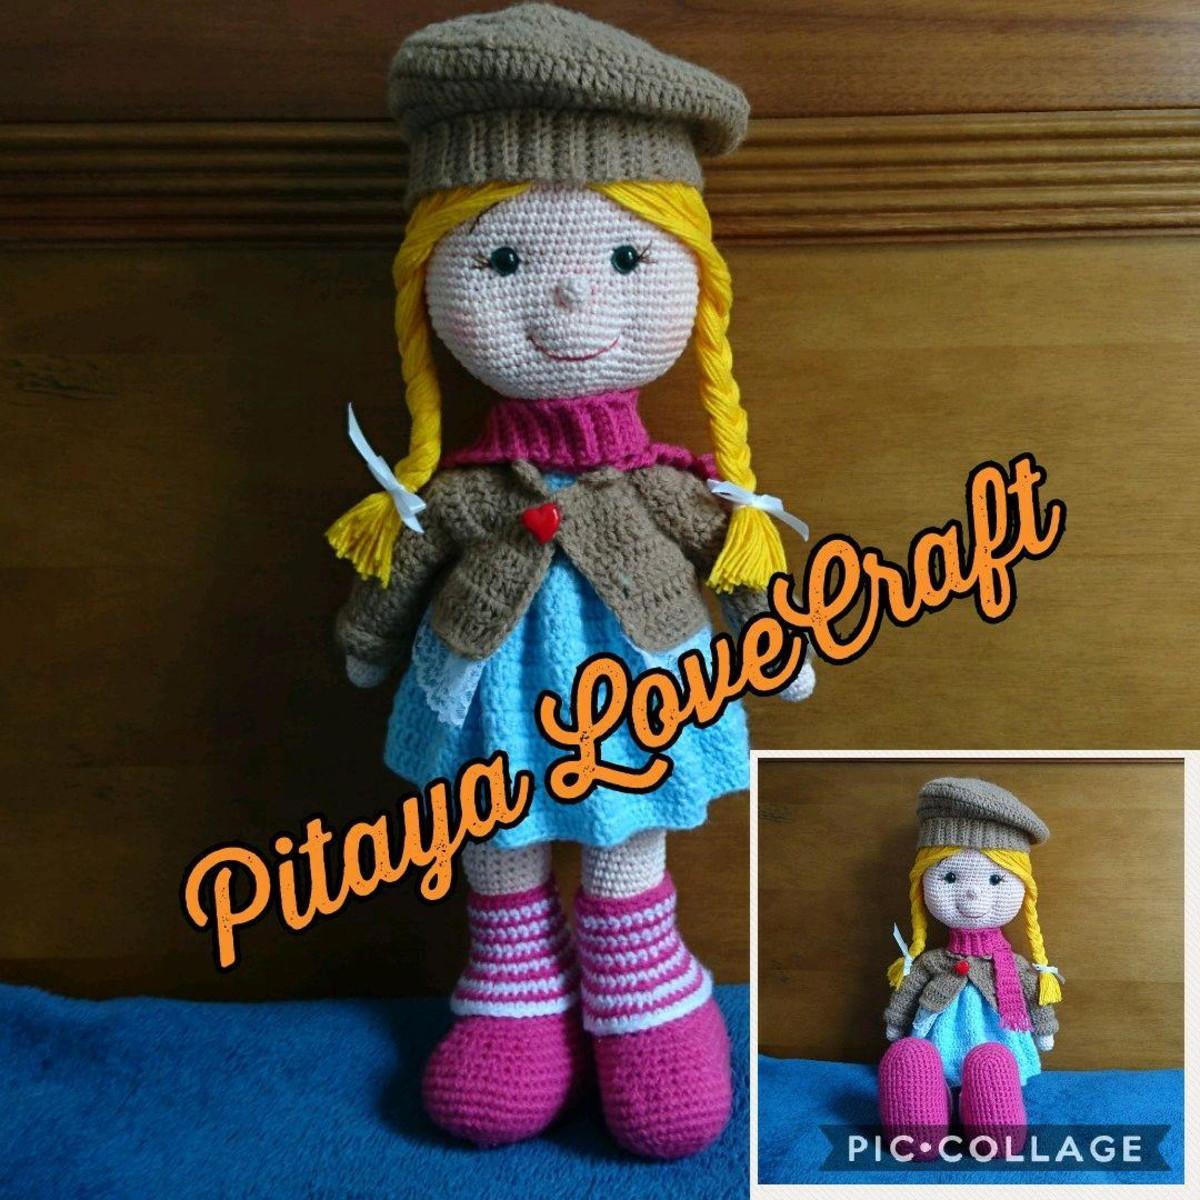 Tonton Doll, Amigurumi Samyeli Bebek   Crafting   Crochet stitches ...   1200x1200